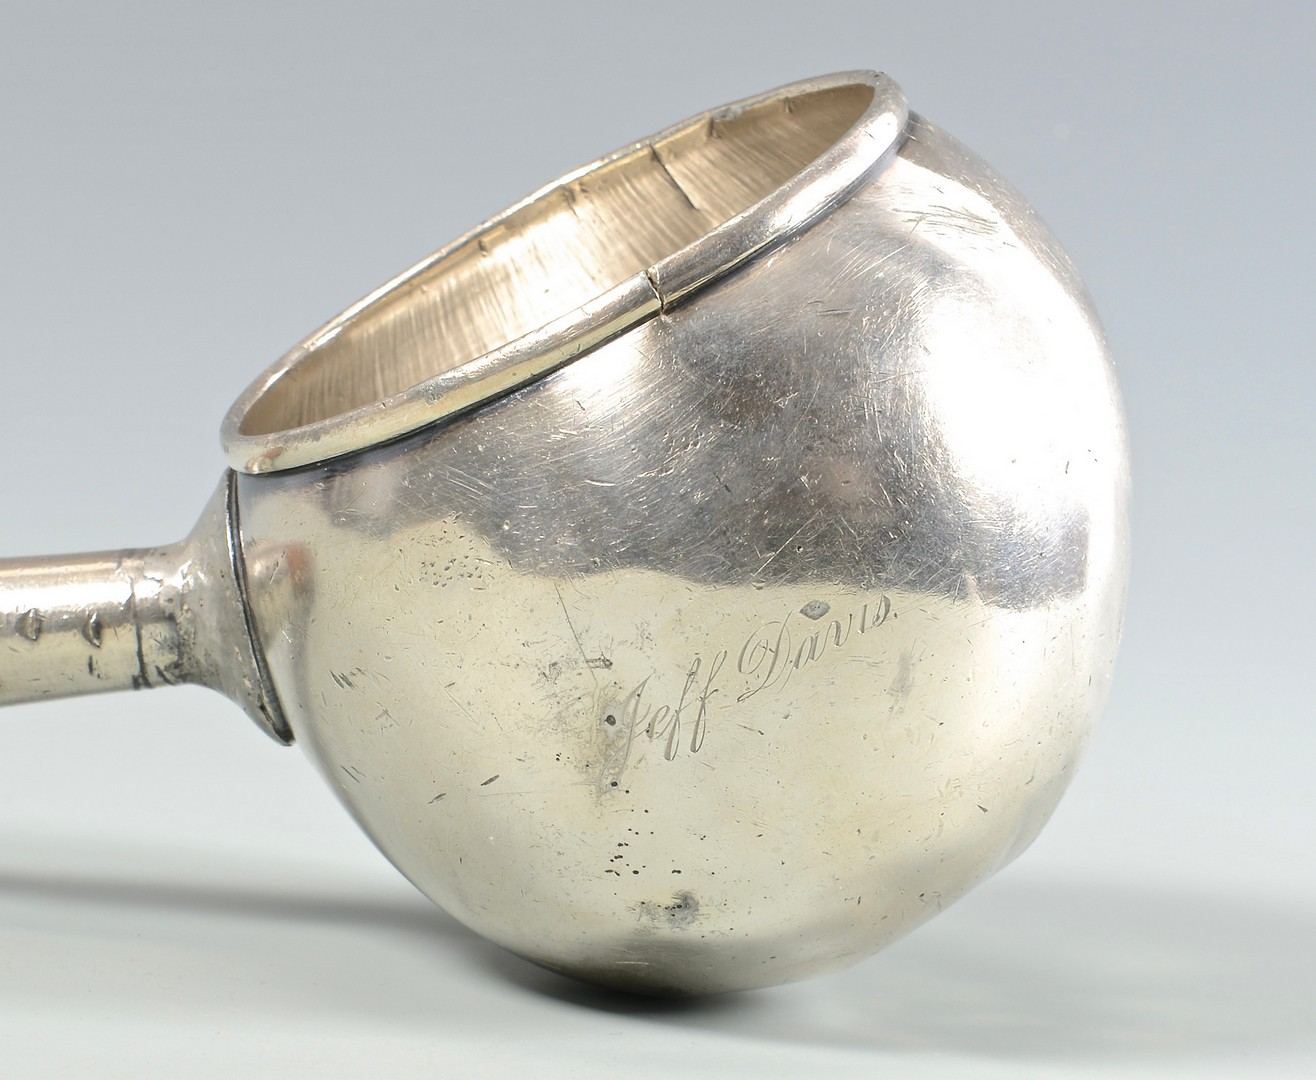 Lot 53: Coin Silver Dipper, Jeff Davis inscription